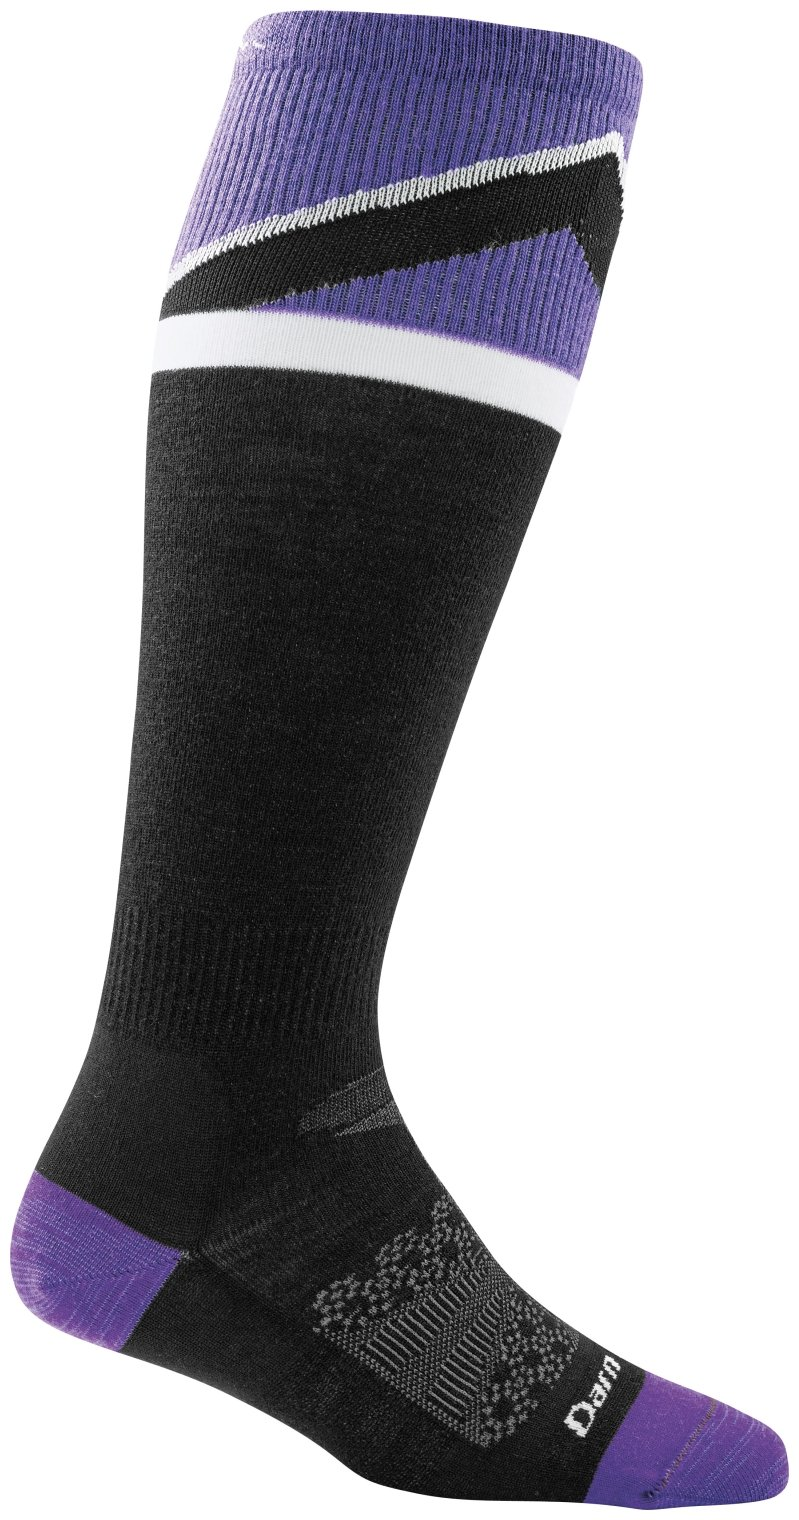 Darn Tough Mountain Top Light Sock - Women's Purple Medium